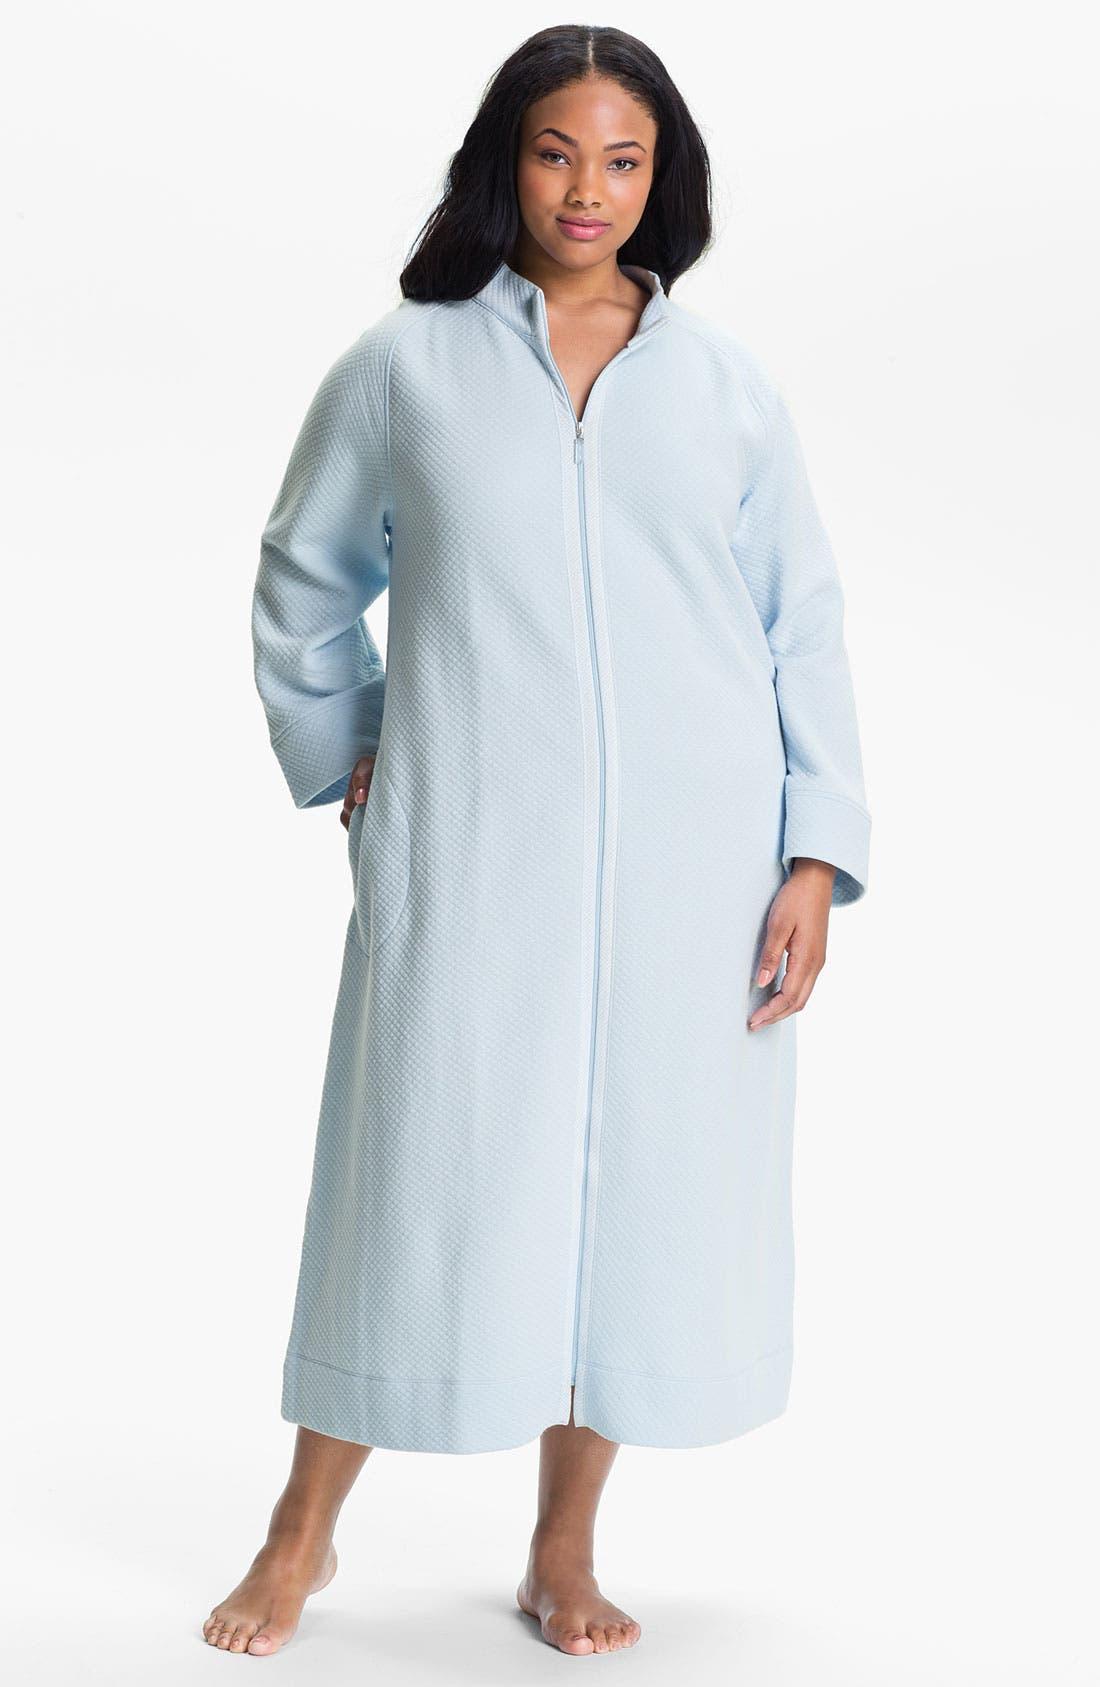 Alternate Image 1 Selected - Carole Hochman Designs Diamond Quilt Zip Front Robe (Plus)